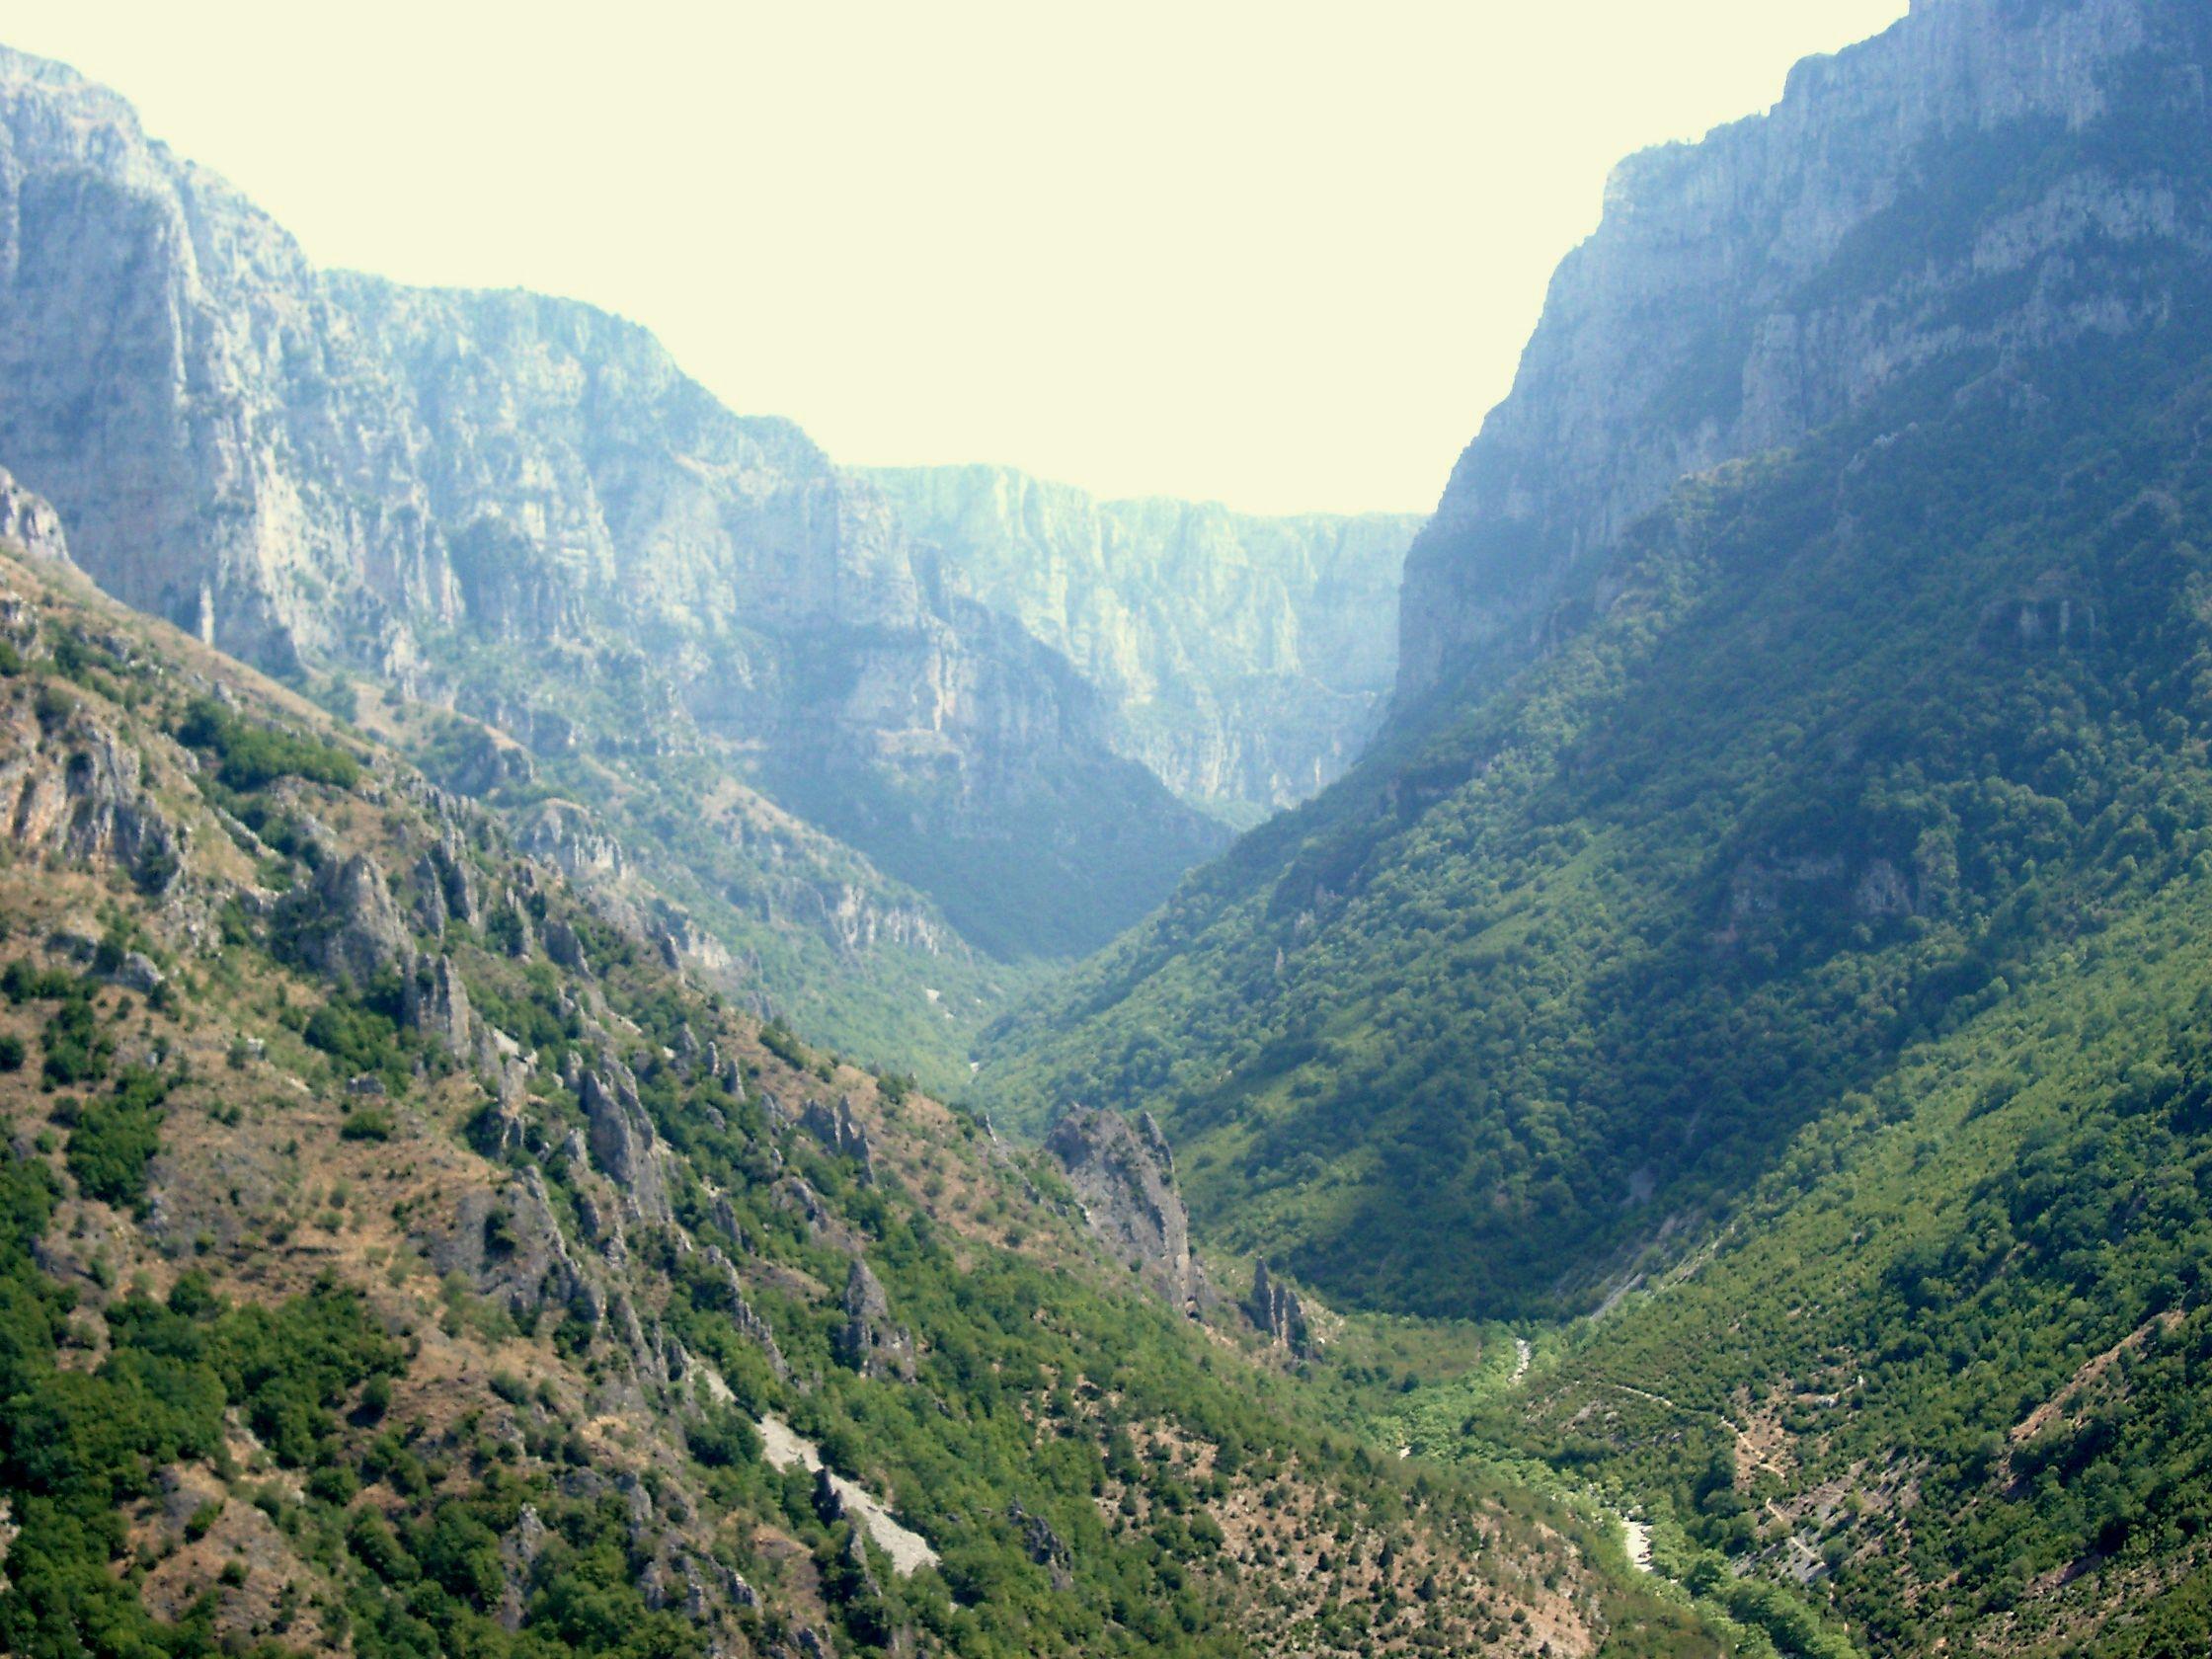 File:Vikos Gorge, Epirus, Greece 01.jpg